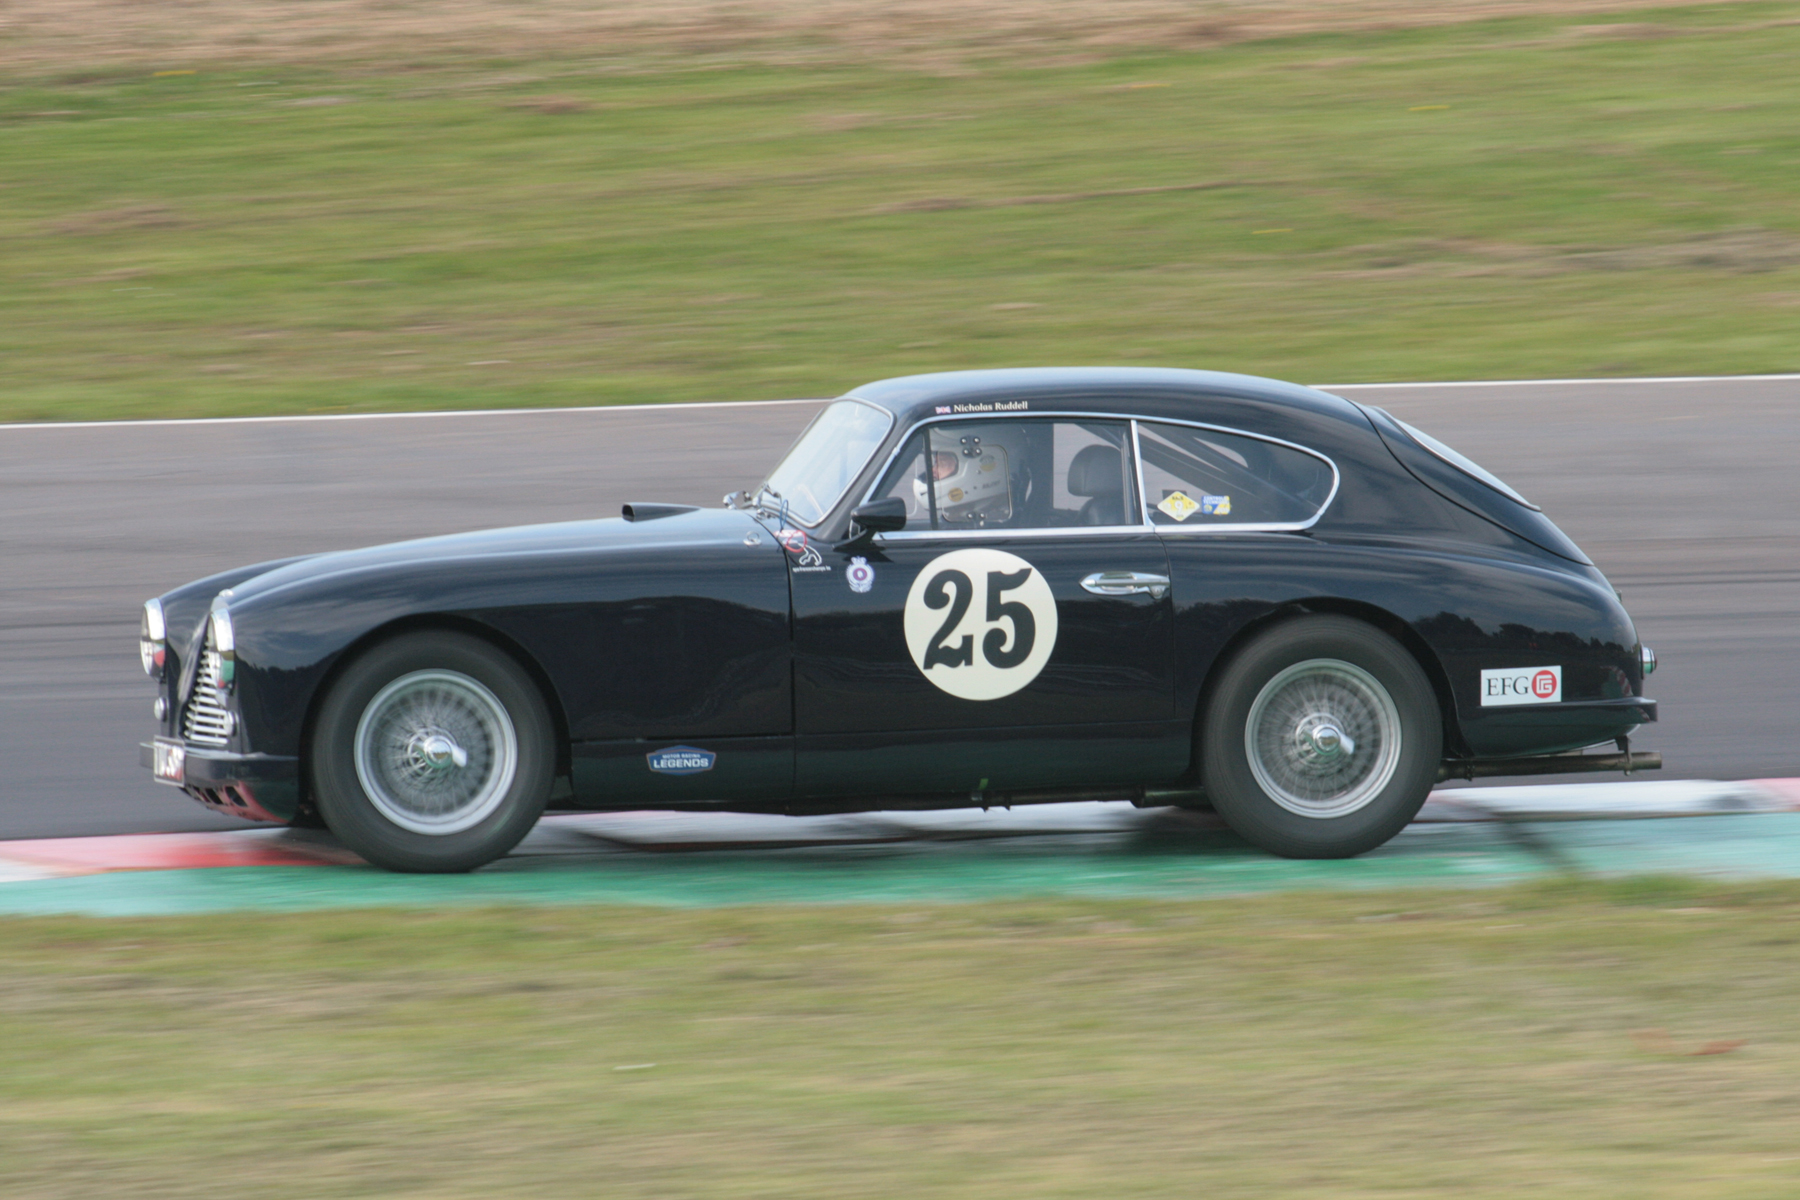 Nick Ruddell's Aston Martin DB2/4 in the Esses  Photo - John Turner